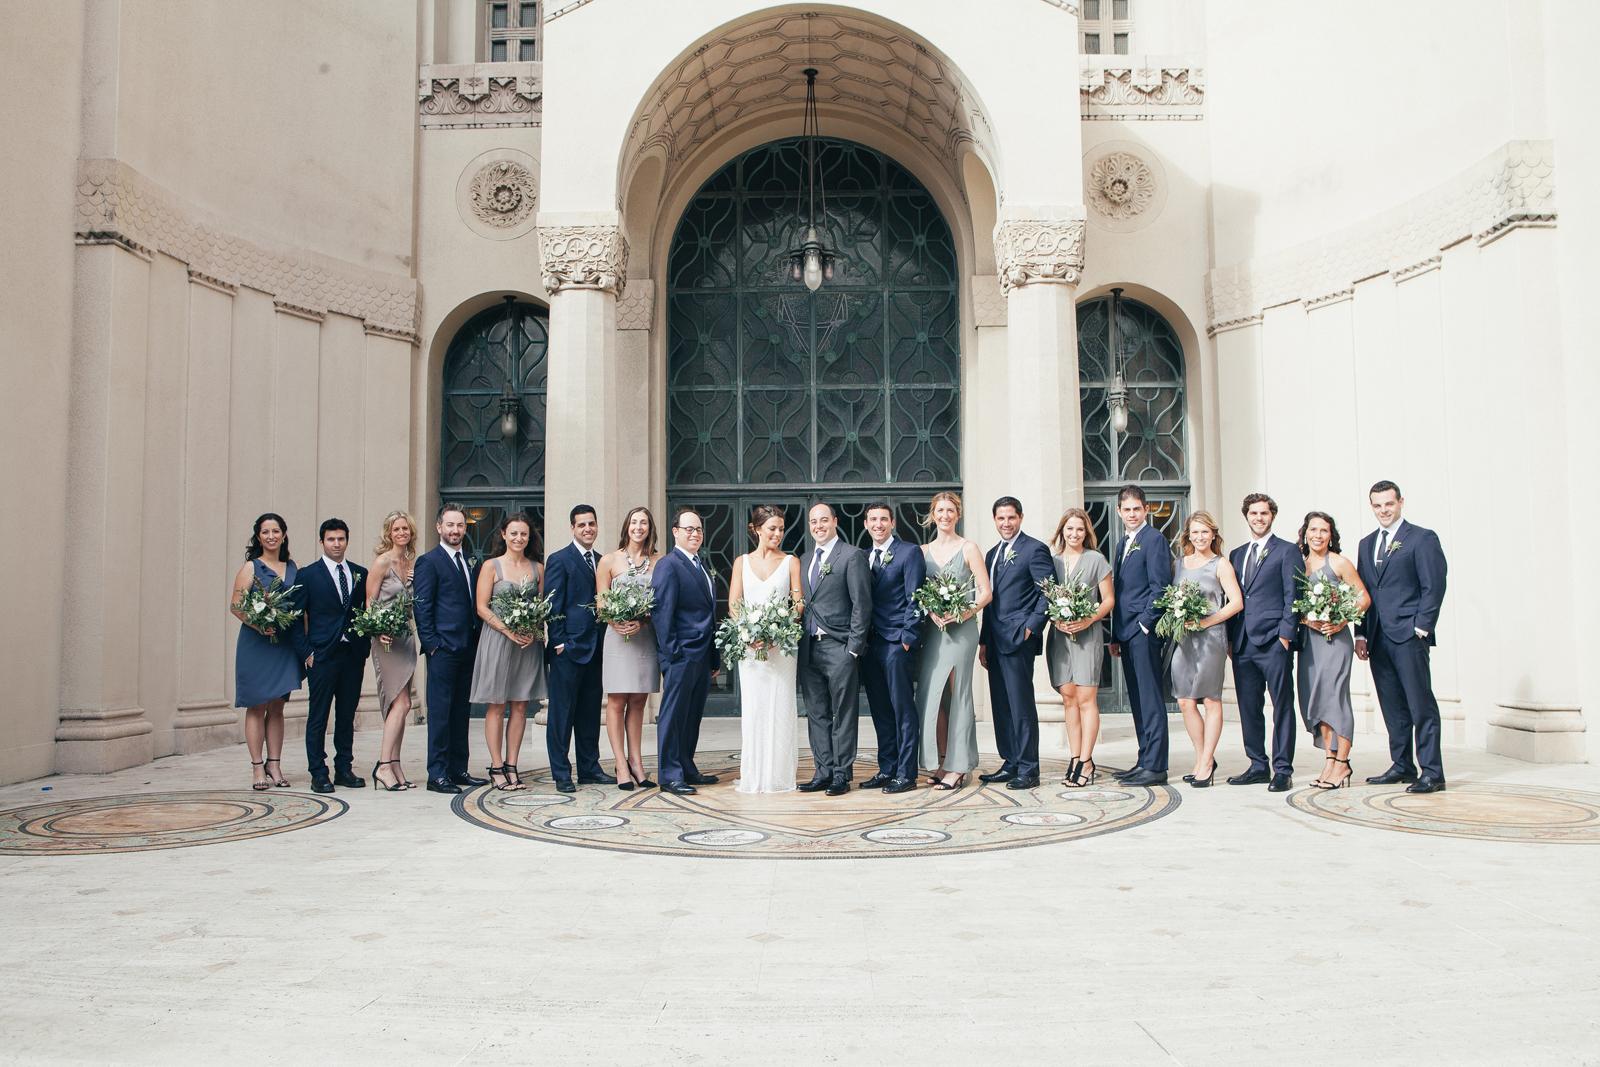 temple_emmanuel_jewish_wedding_san_francisco_ca_sarah_andrew_ebony_siovhan_bokeh_photography_33.jpg